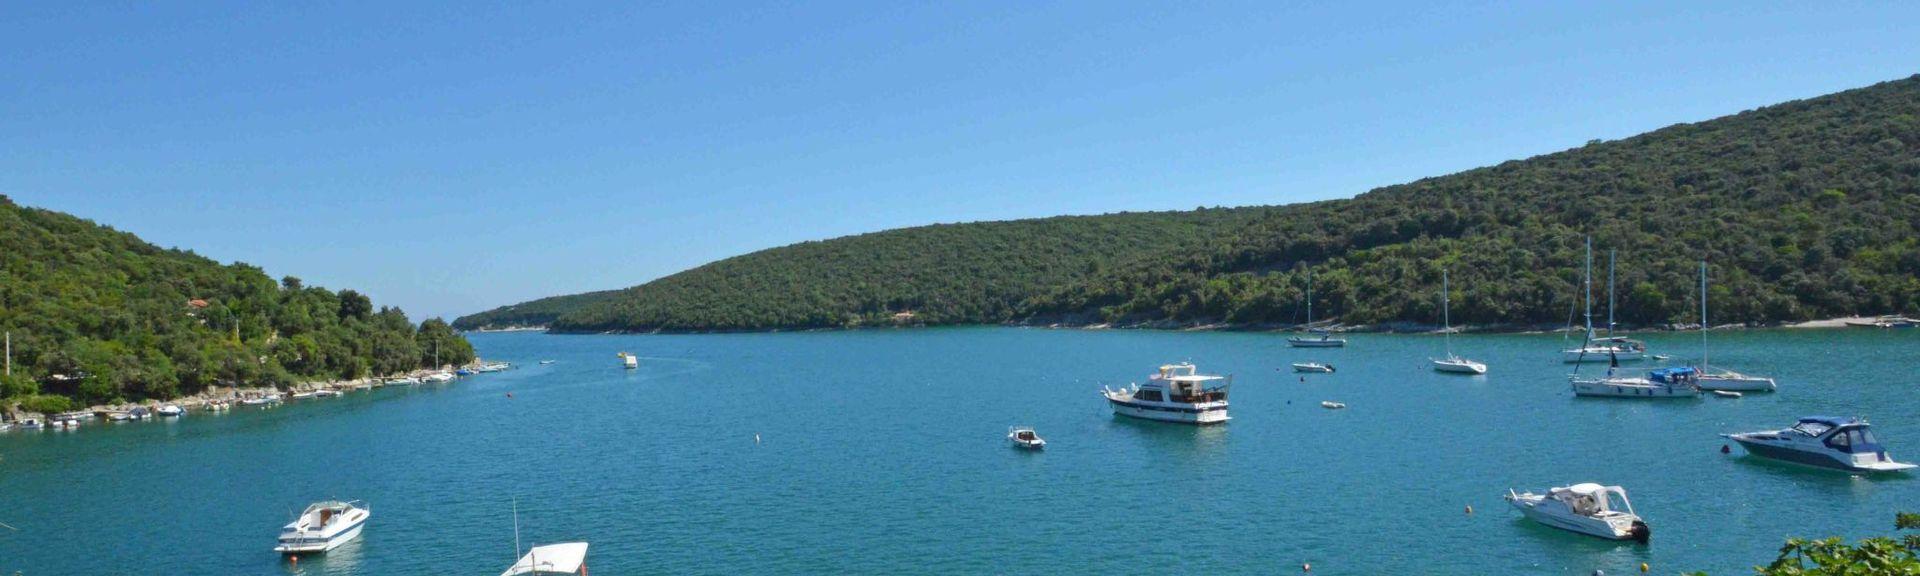 Labin, Istria County, Croatia